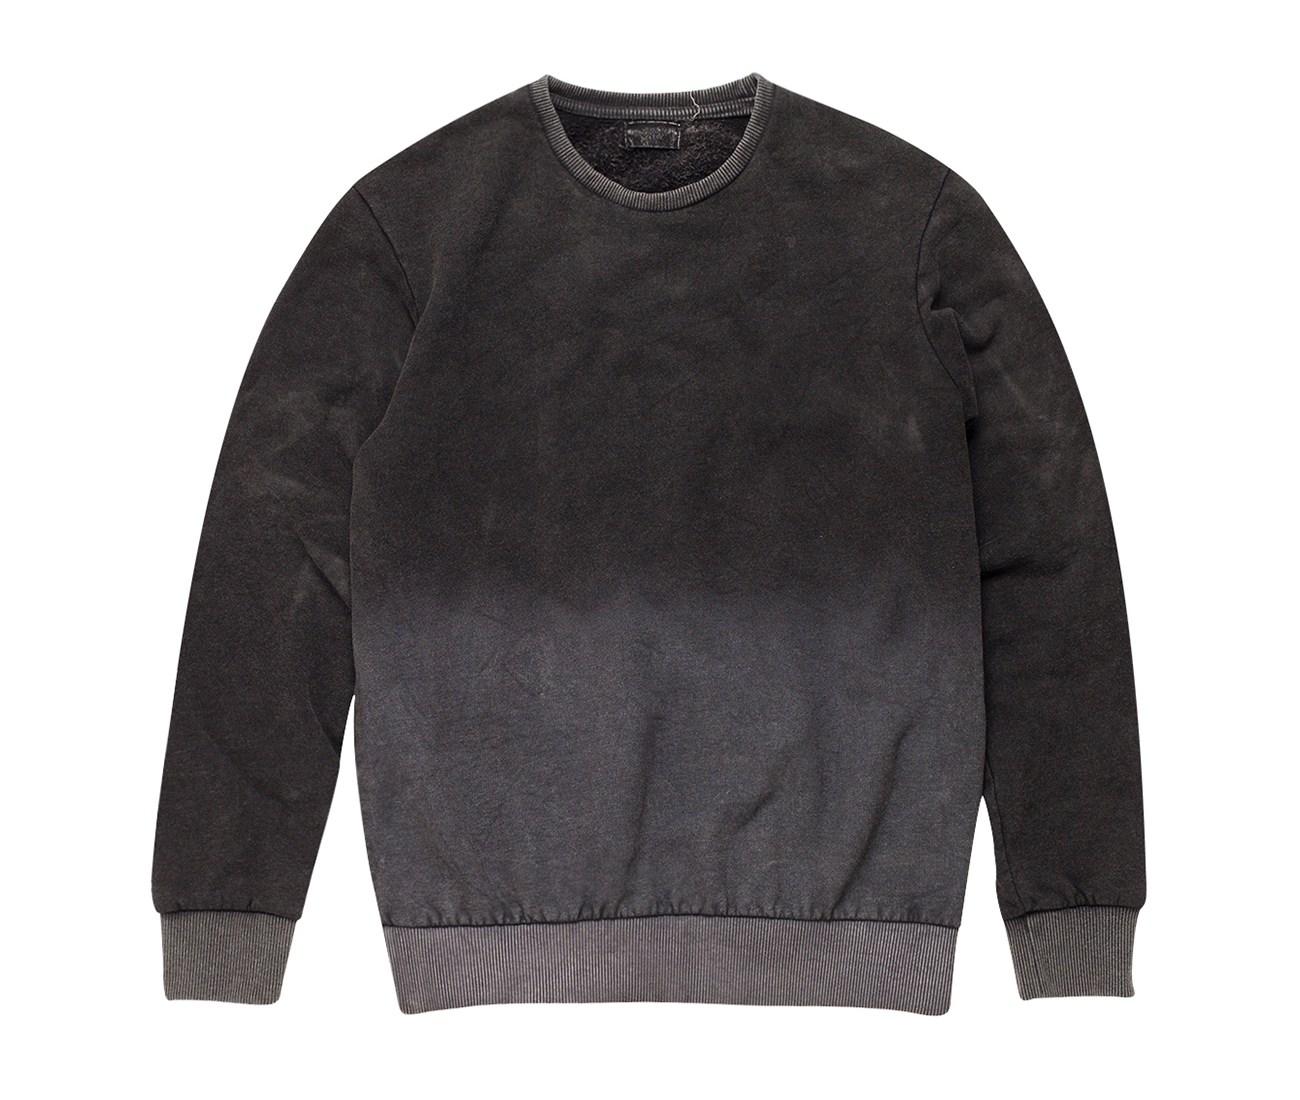 Dip Dye Black Cotton Sweatshirt by the Project Garments